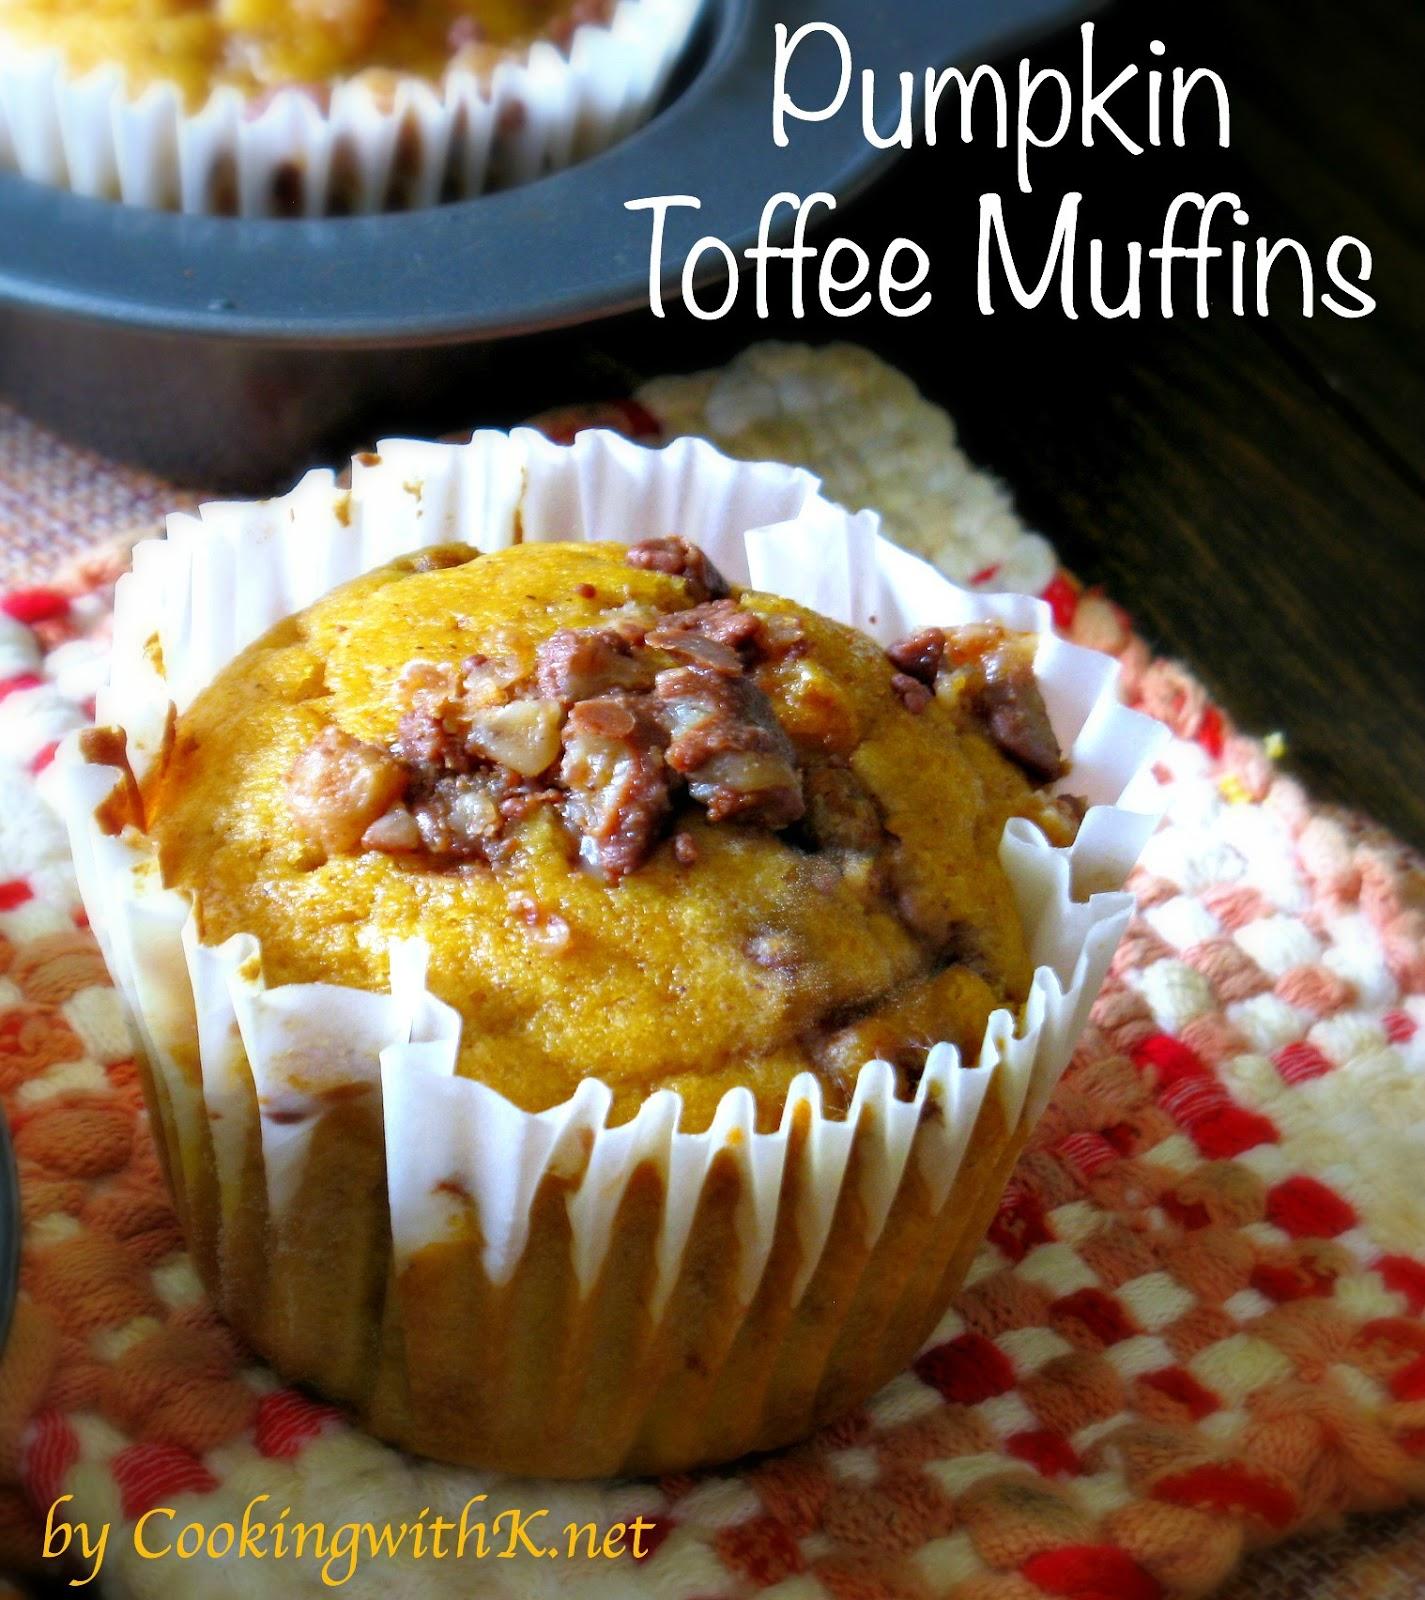 Morning Glory Muffins Using Carrot Cake Mix